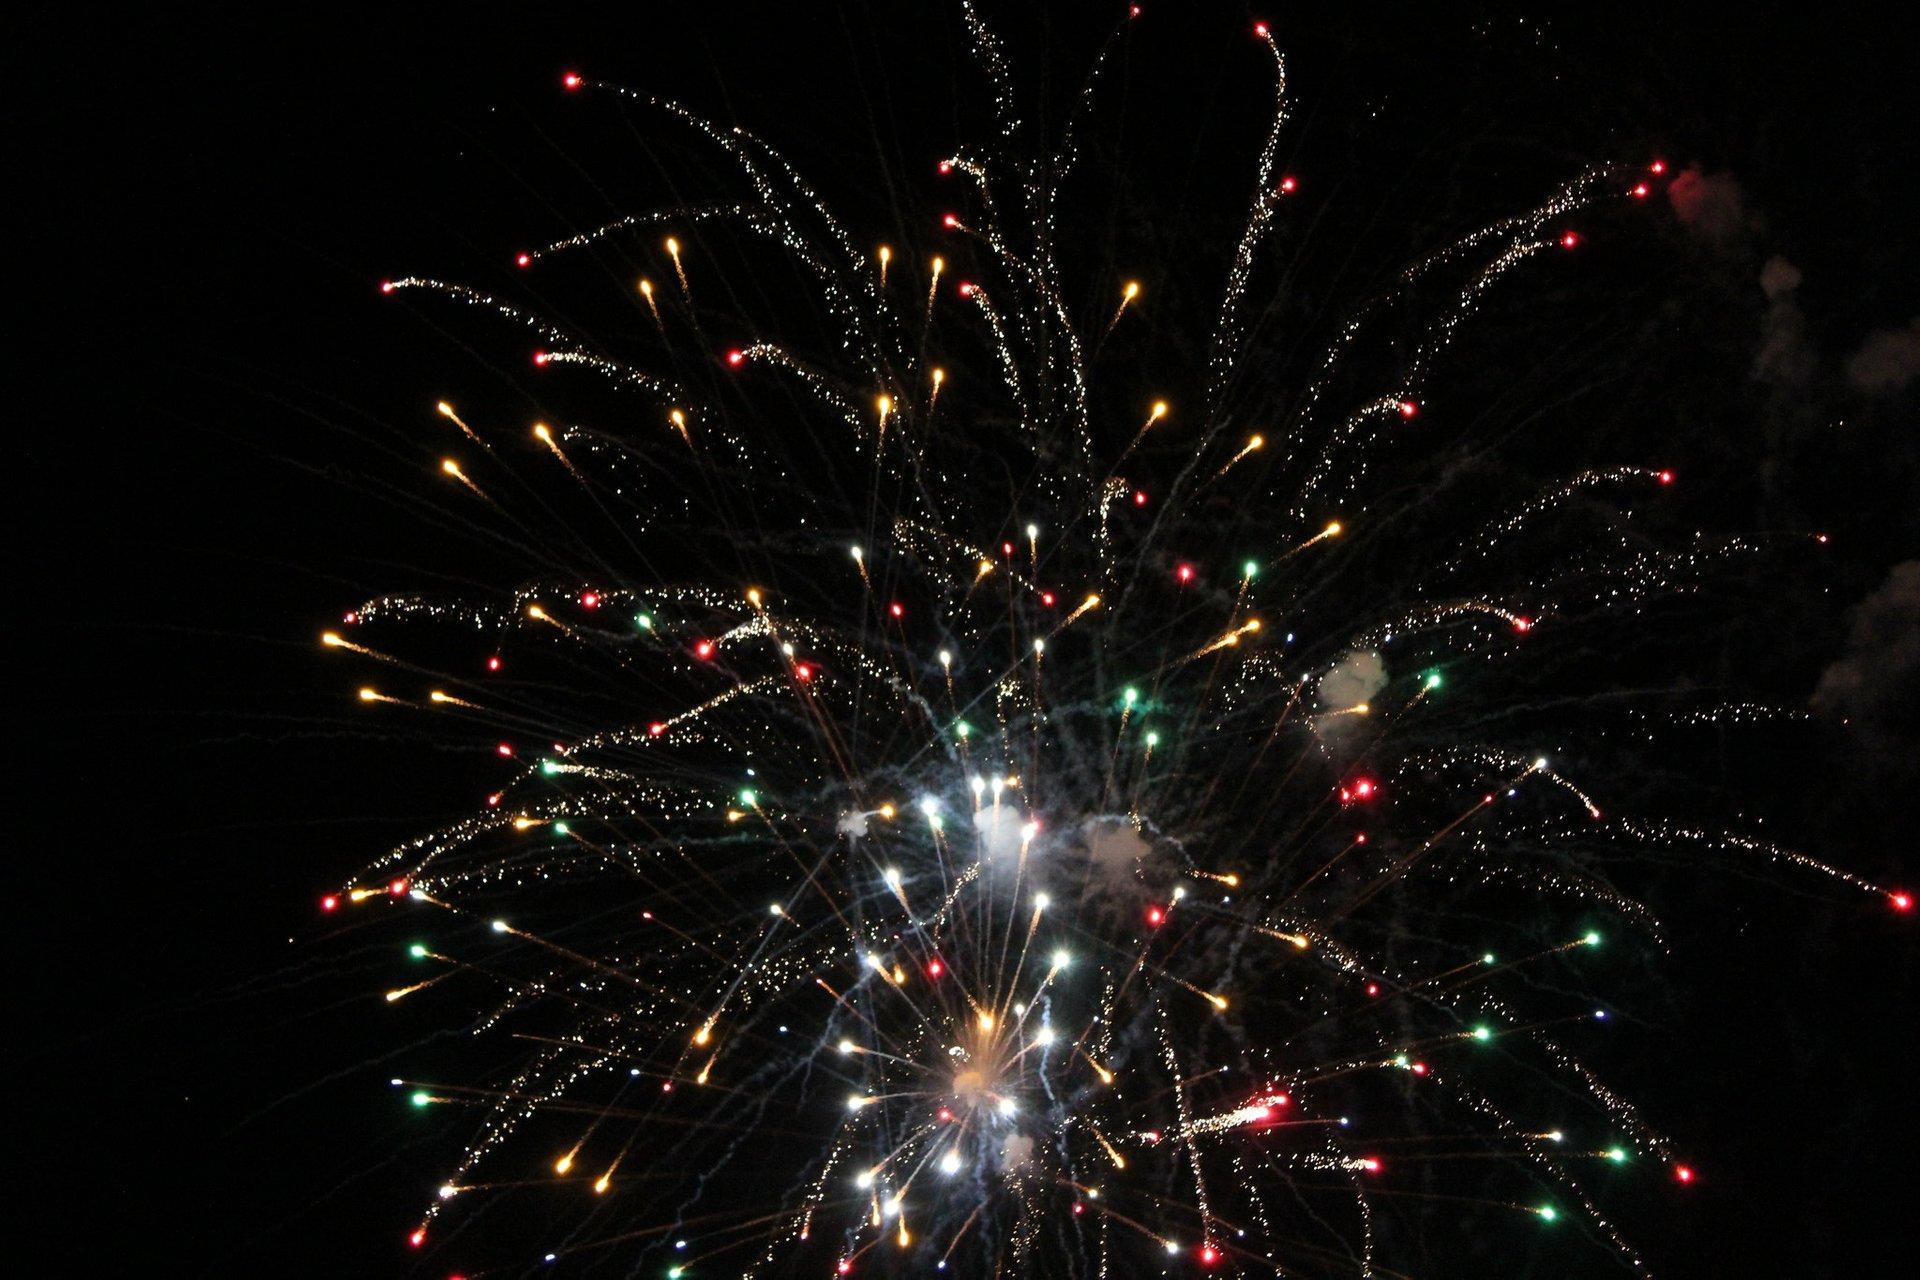 Phoenix 4th of July Events & Fireworks in Phoenix, AZ 2020 - Best Time